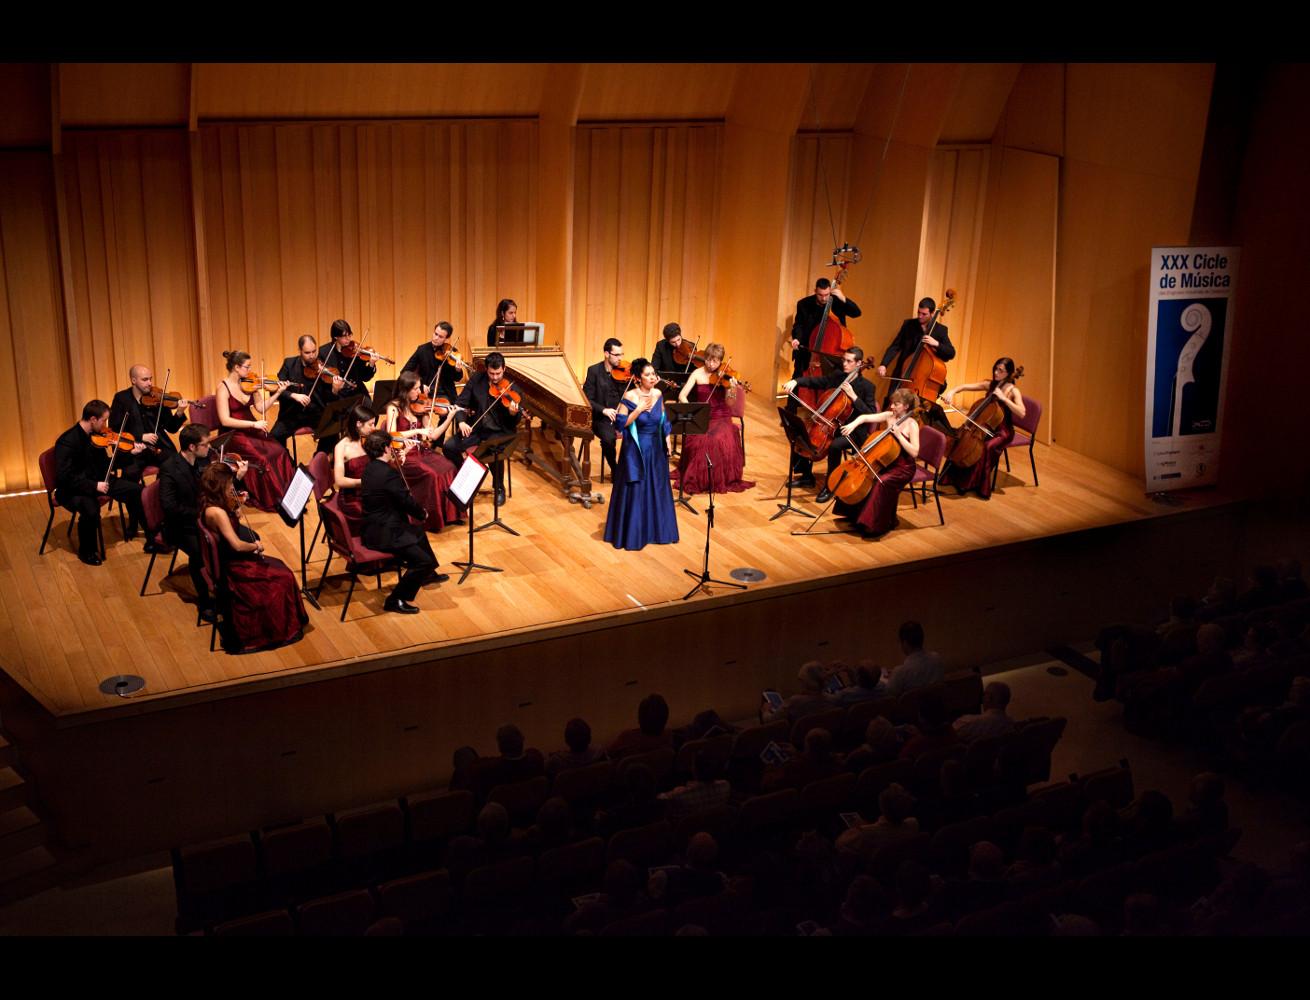 Anna Feu-Orquesta de camara de Galicia.